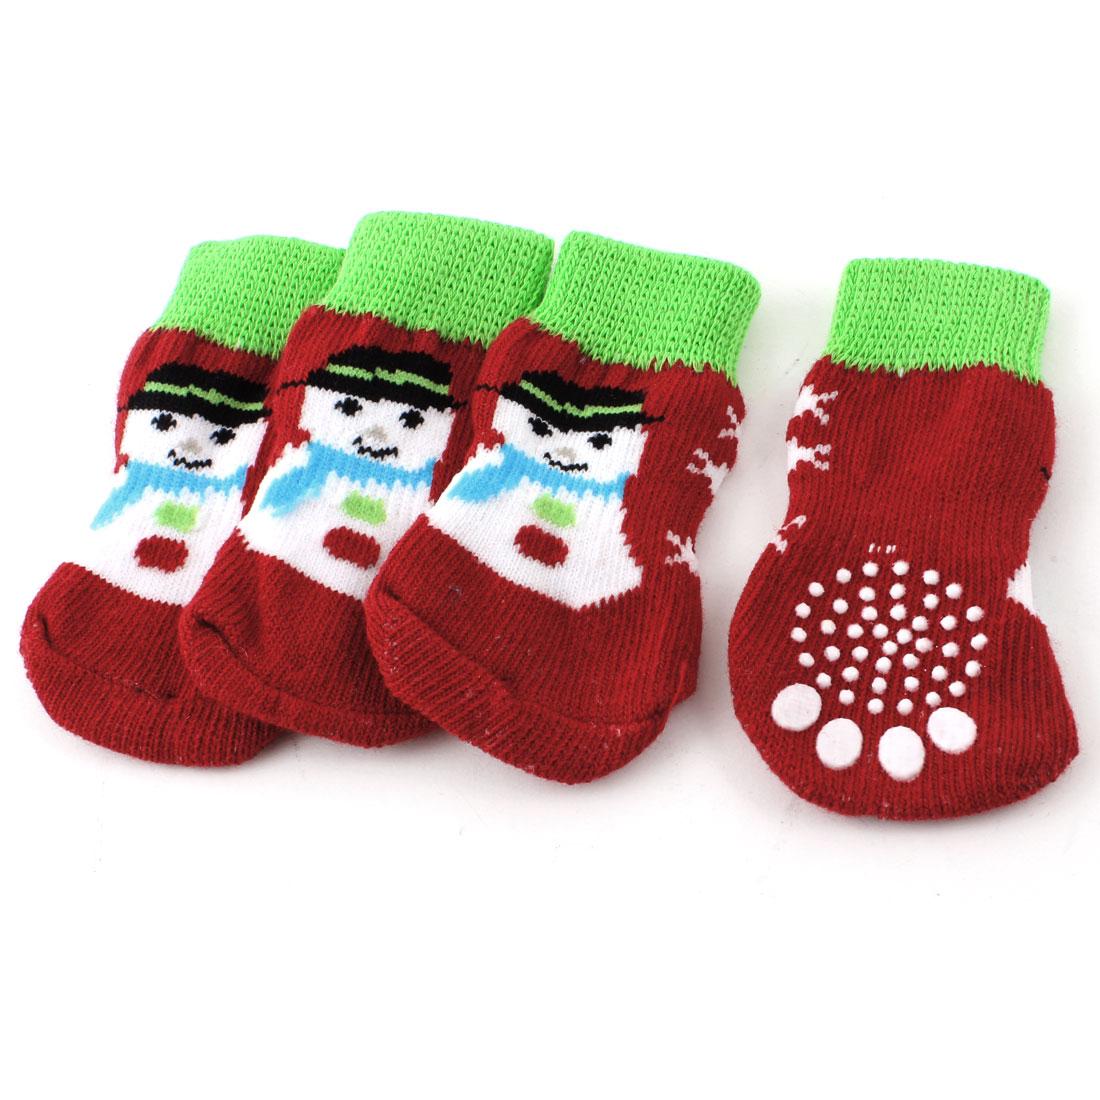 2 Pairs Red Green Knitting Paw Snowman Print Elastic Pet Dog Doggie Socks L